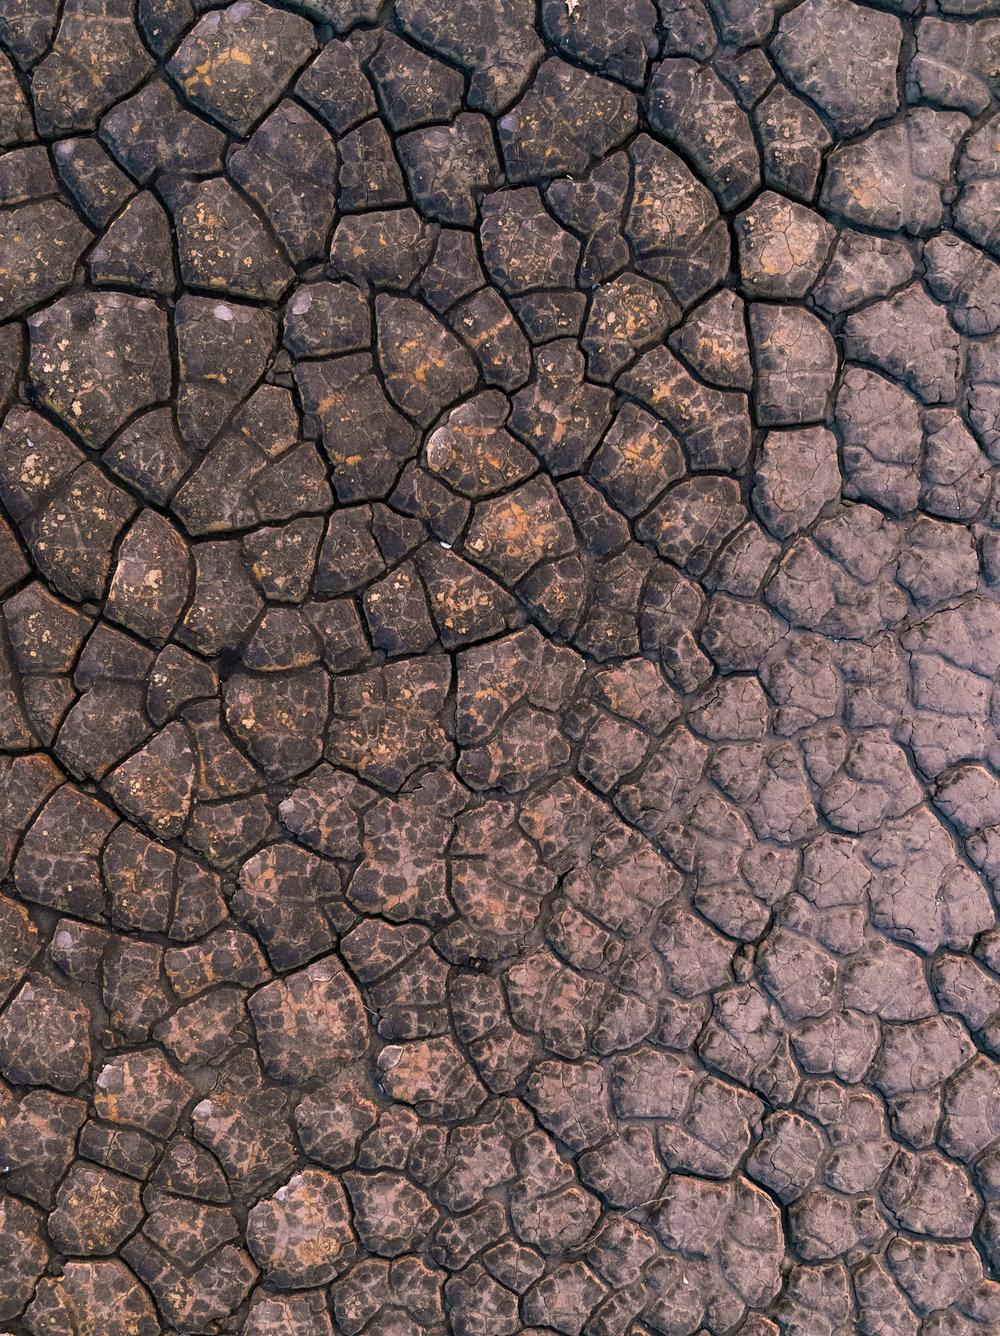 browncrackedrock_typoland_aerial.jpg